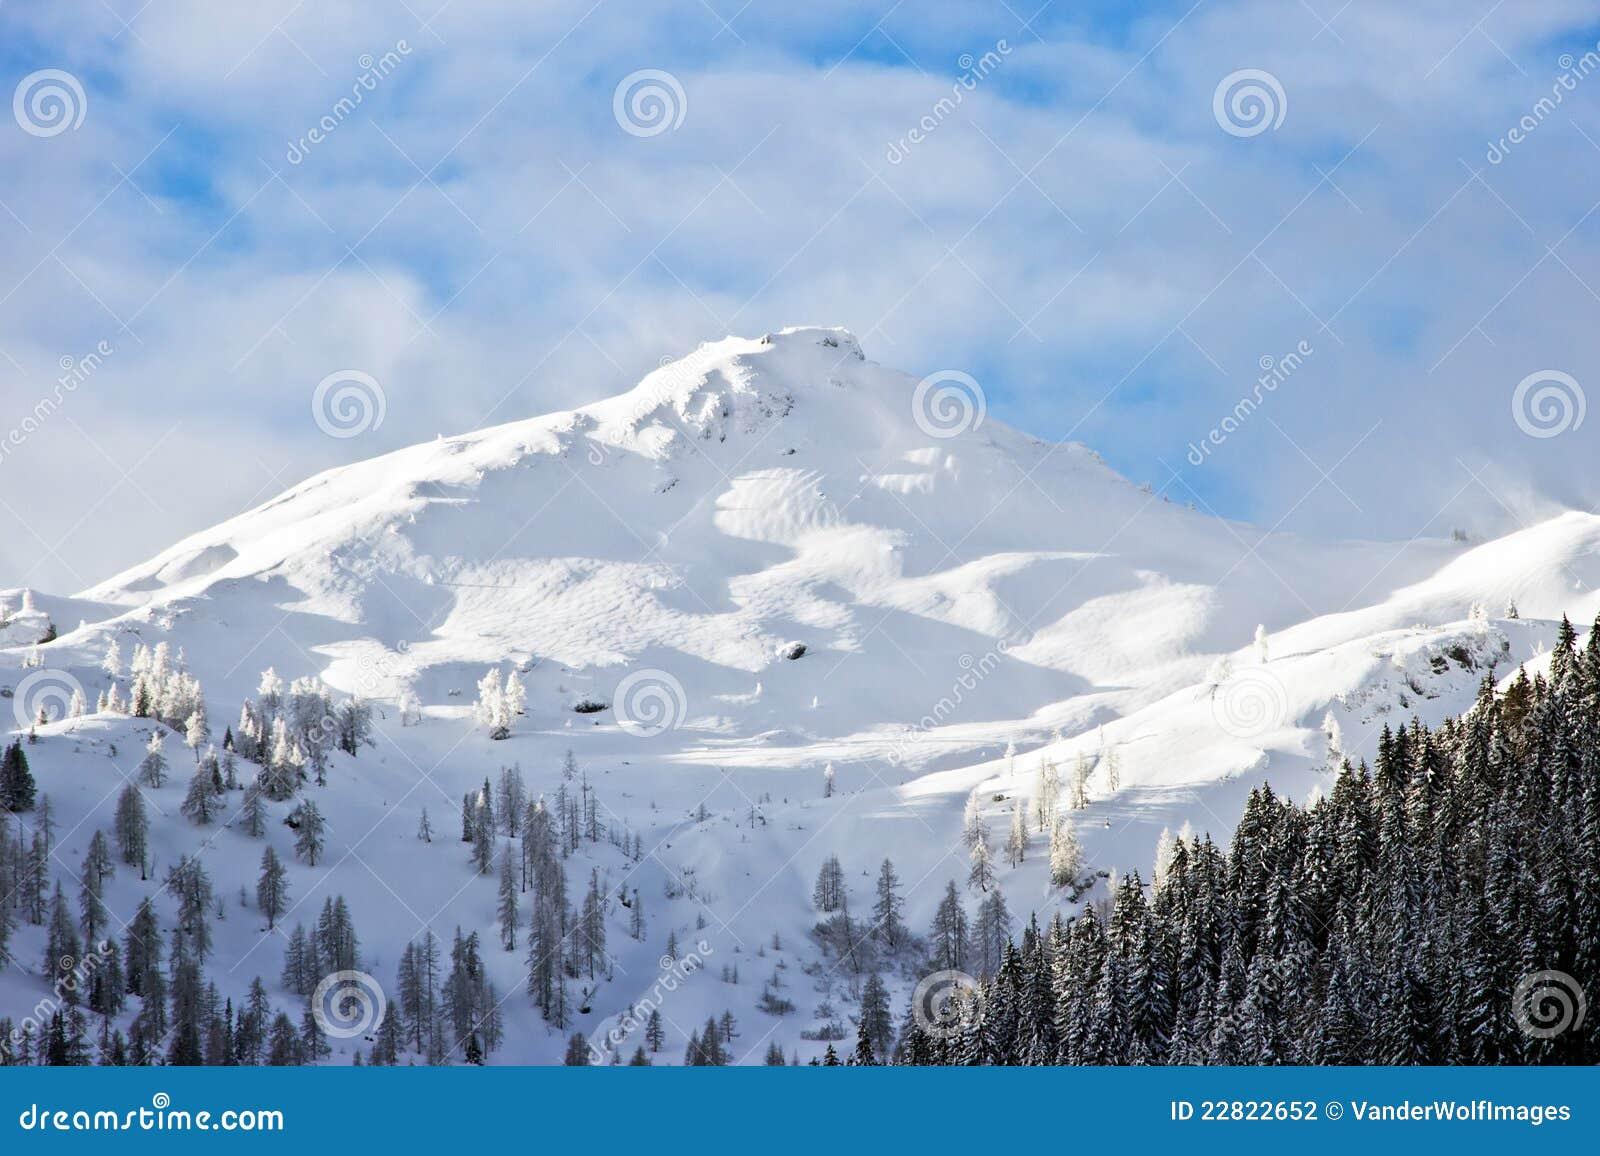 Chalet Beziere - Treeline Chalets - Treeline Chalets - Chalet Plan des Pierrys